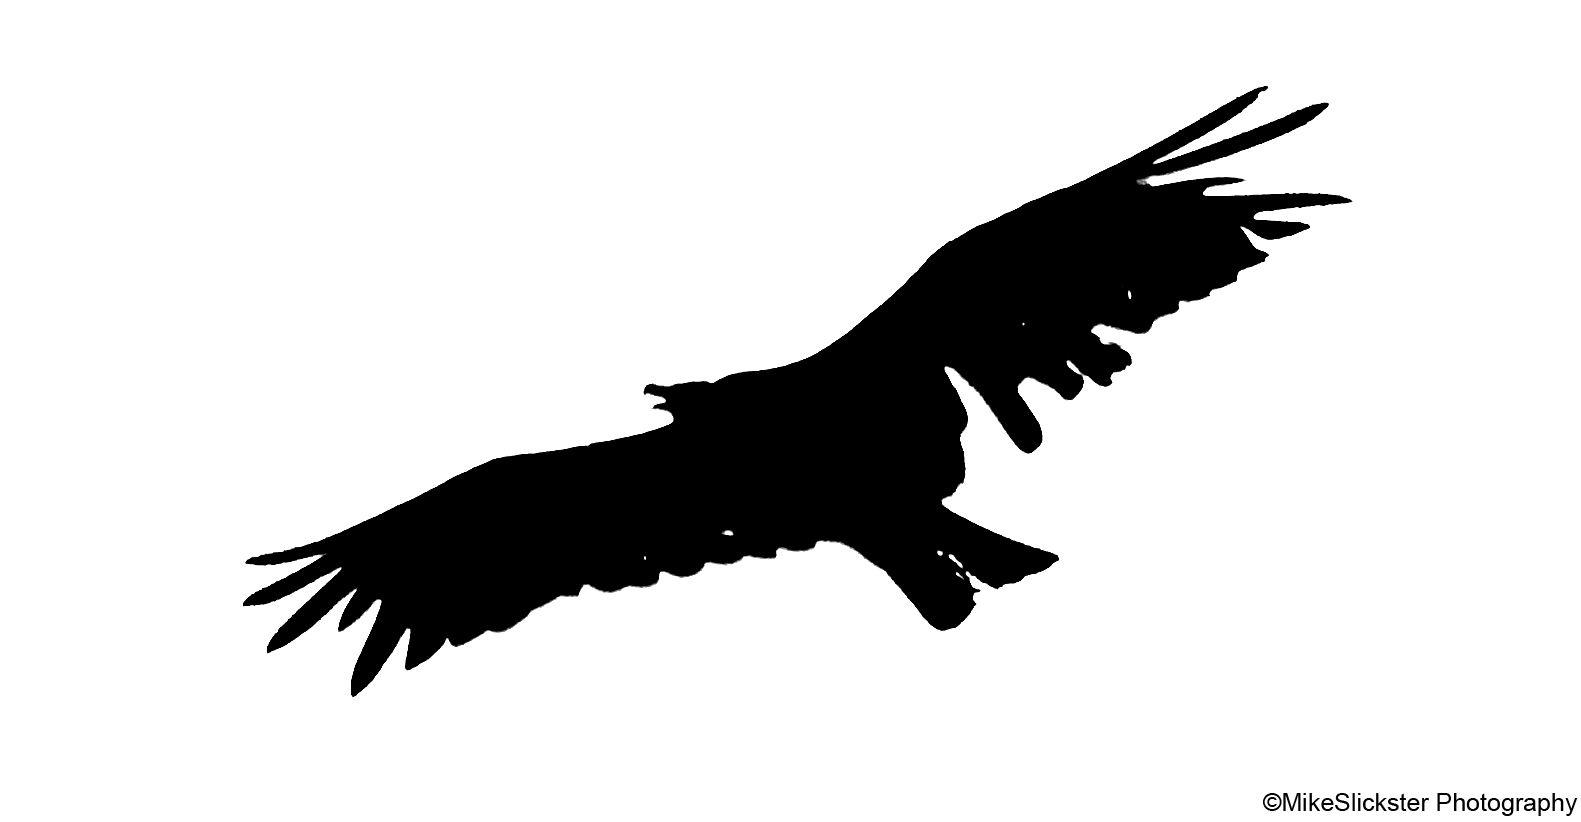 Vulture Silhouette in 2019.